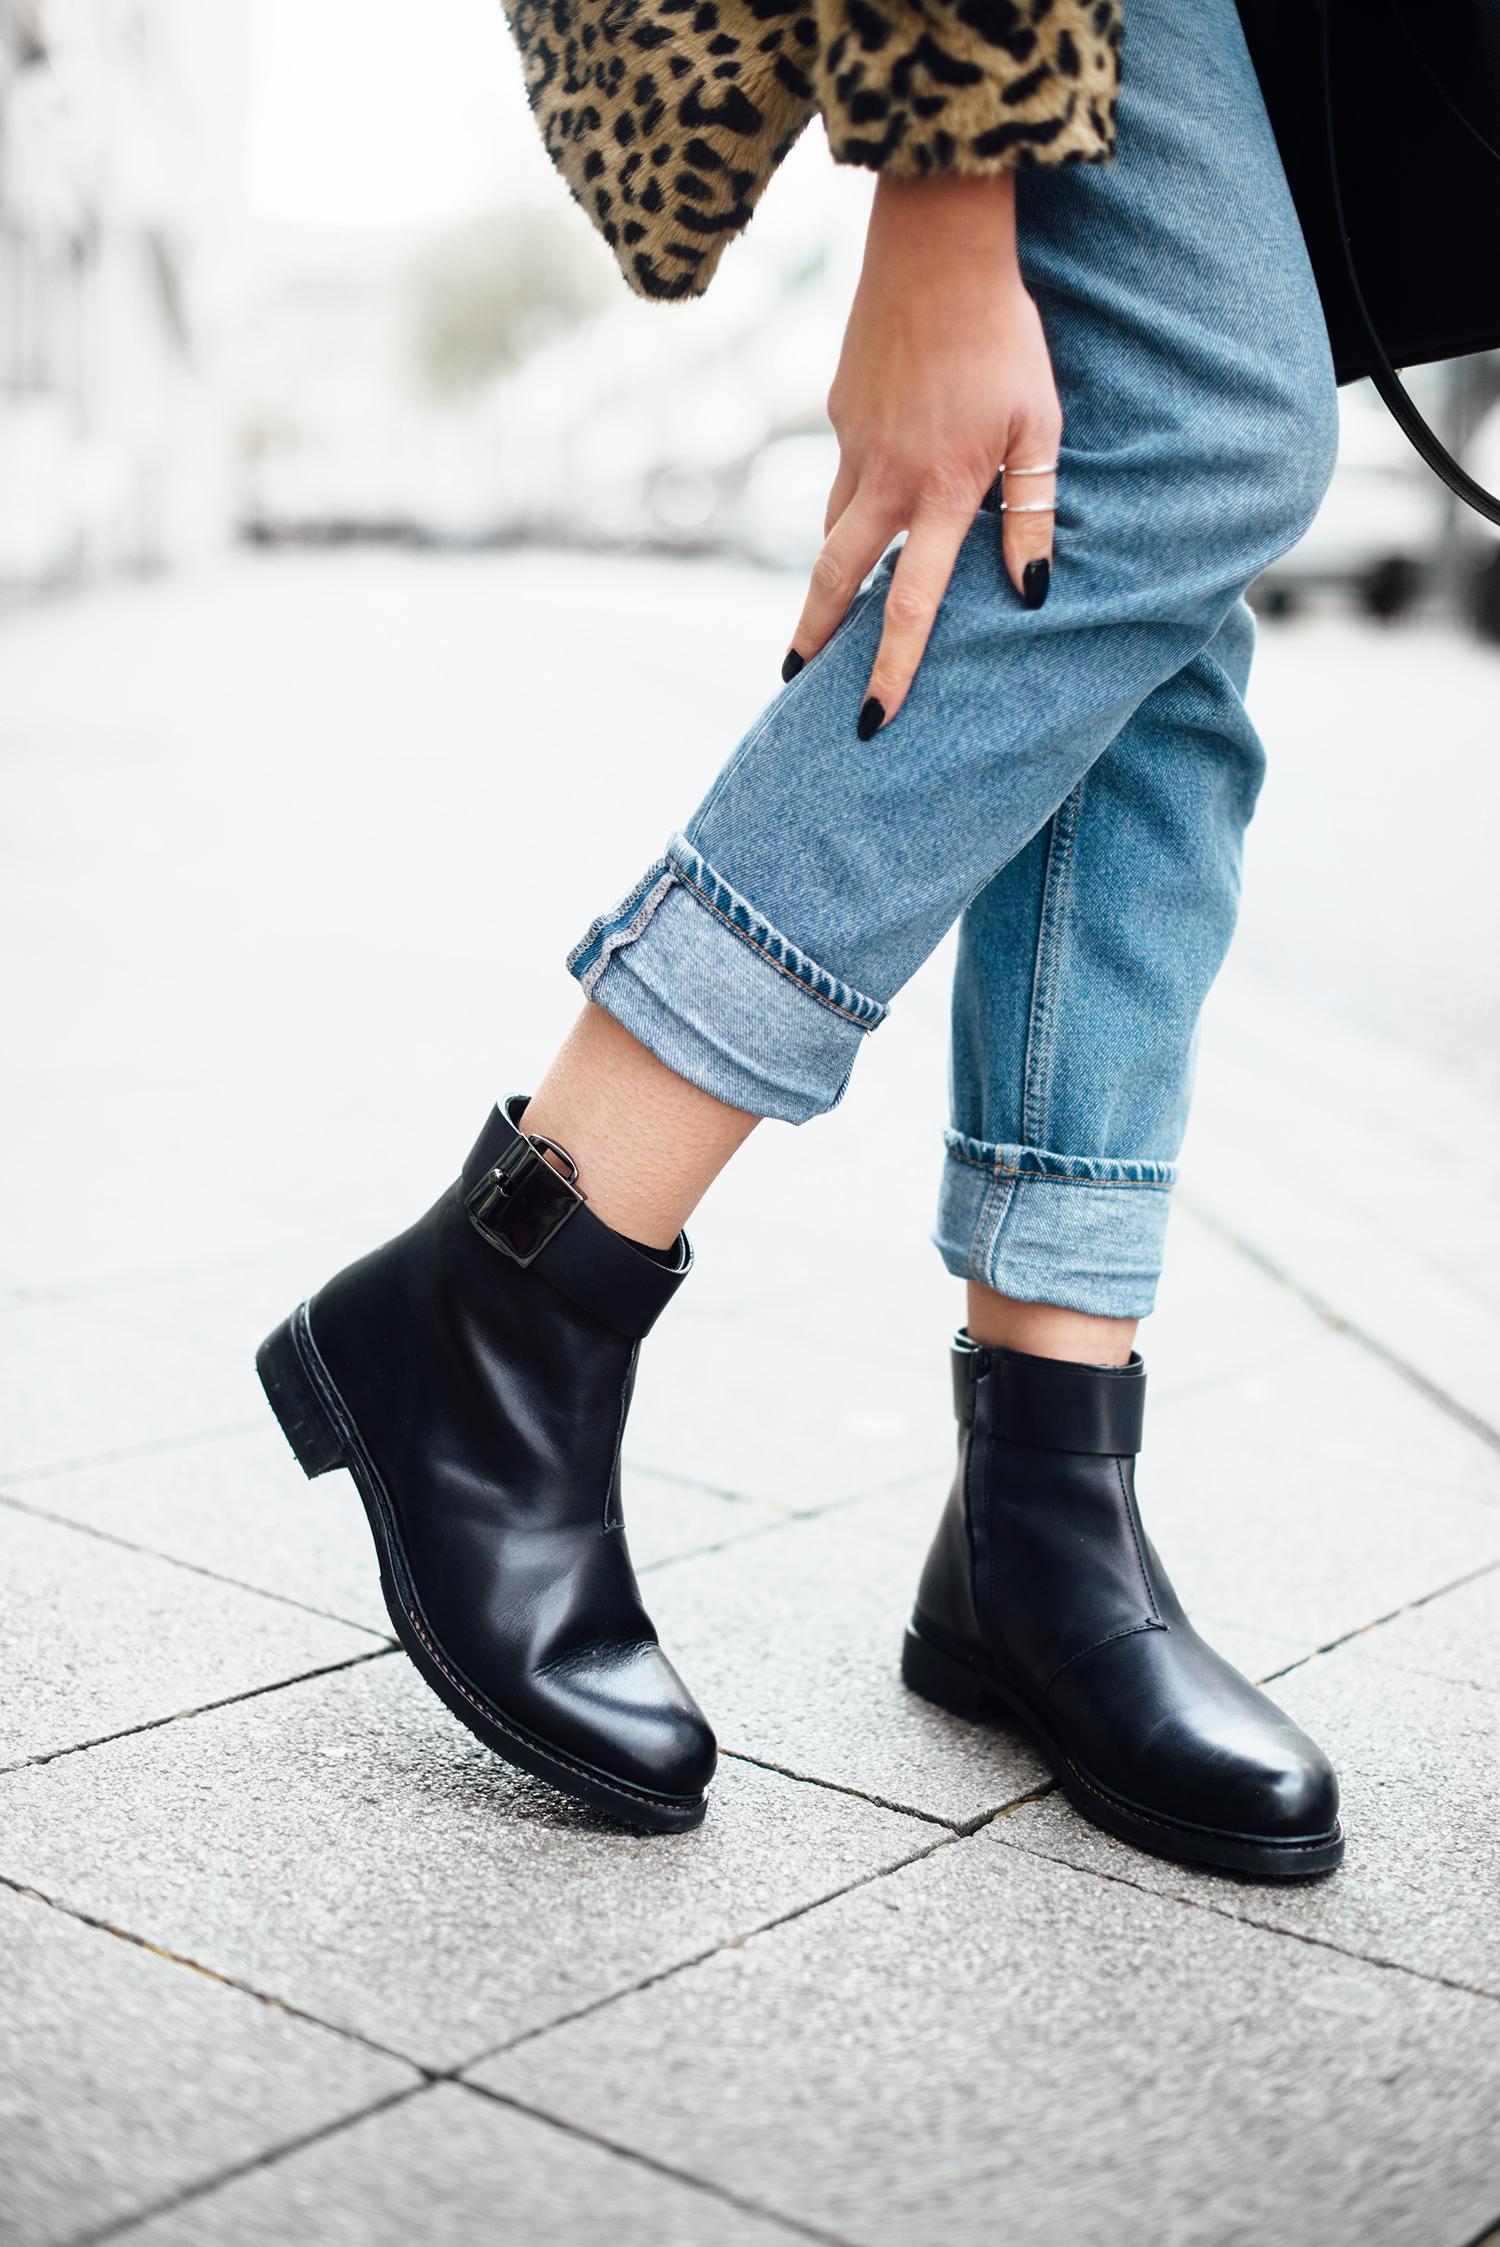 leojacke-zara_mom-jeans_outfit_inspiration_fashionblog_modeblog_kiamisu-6